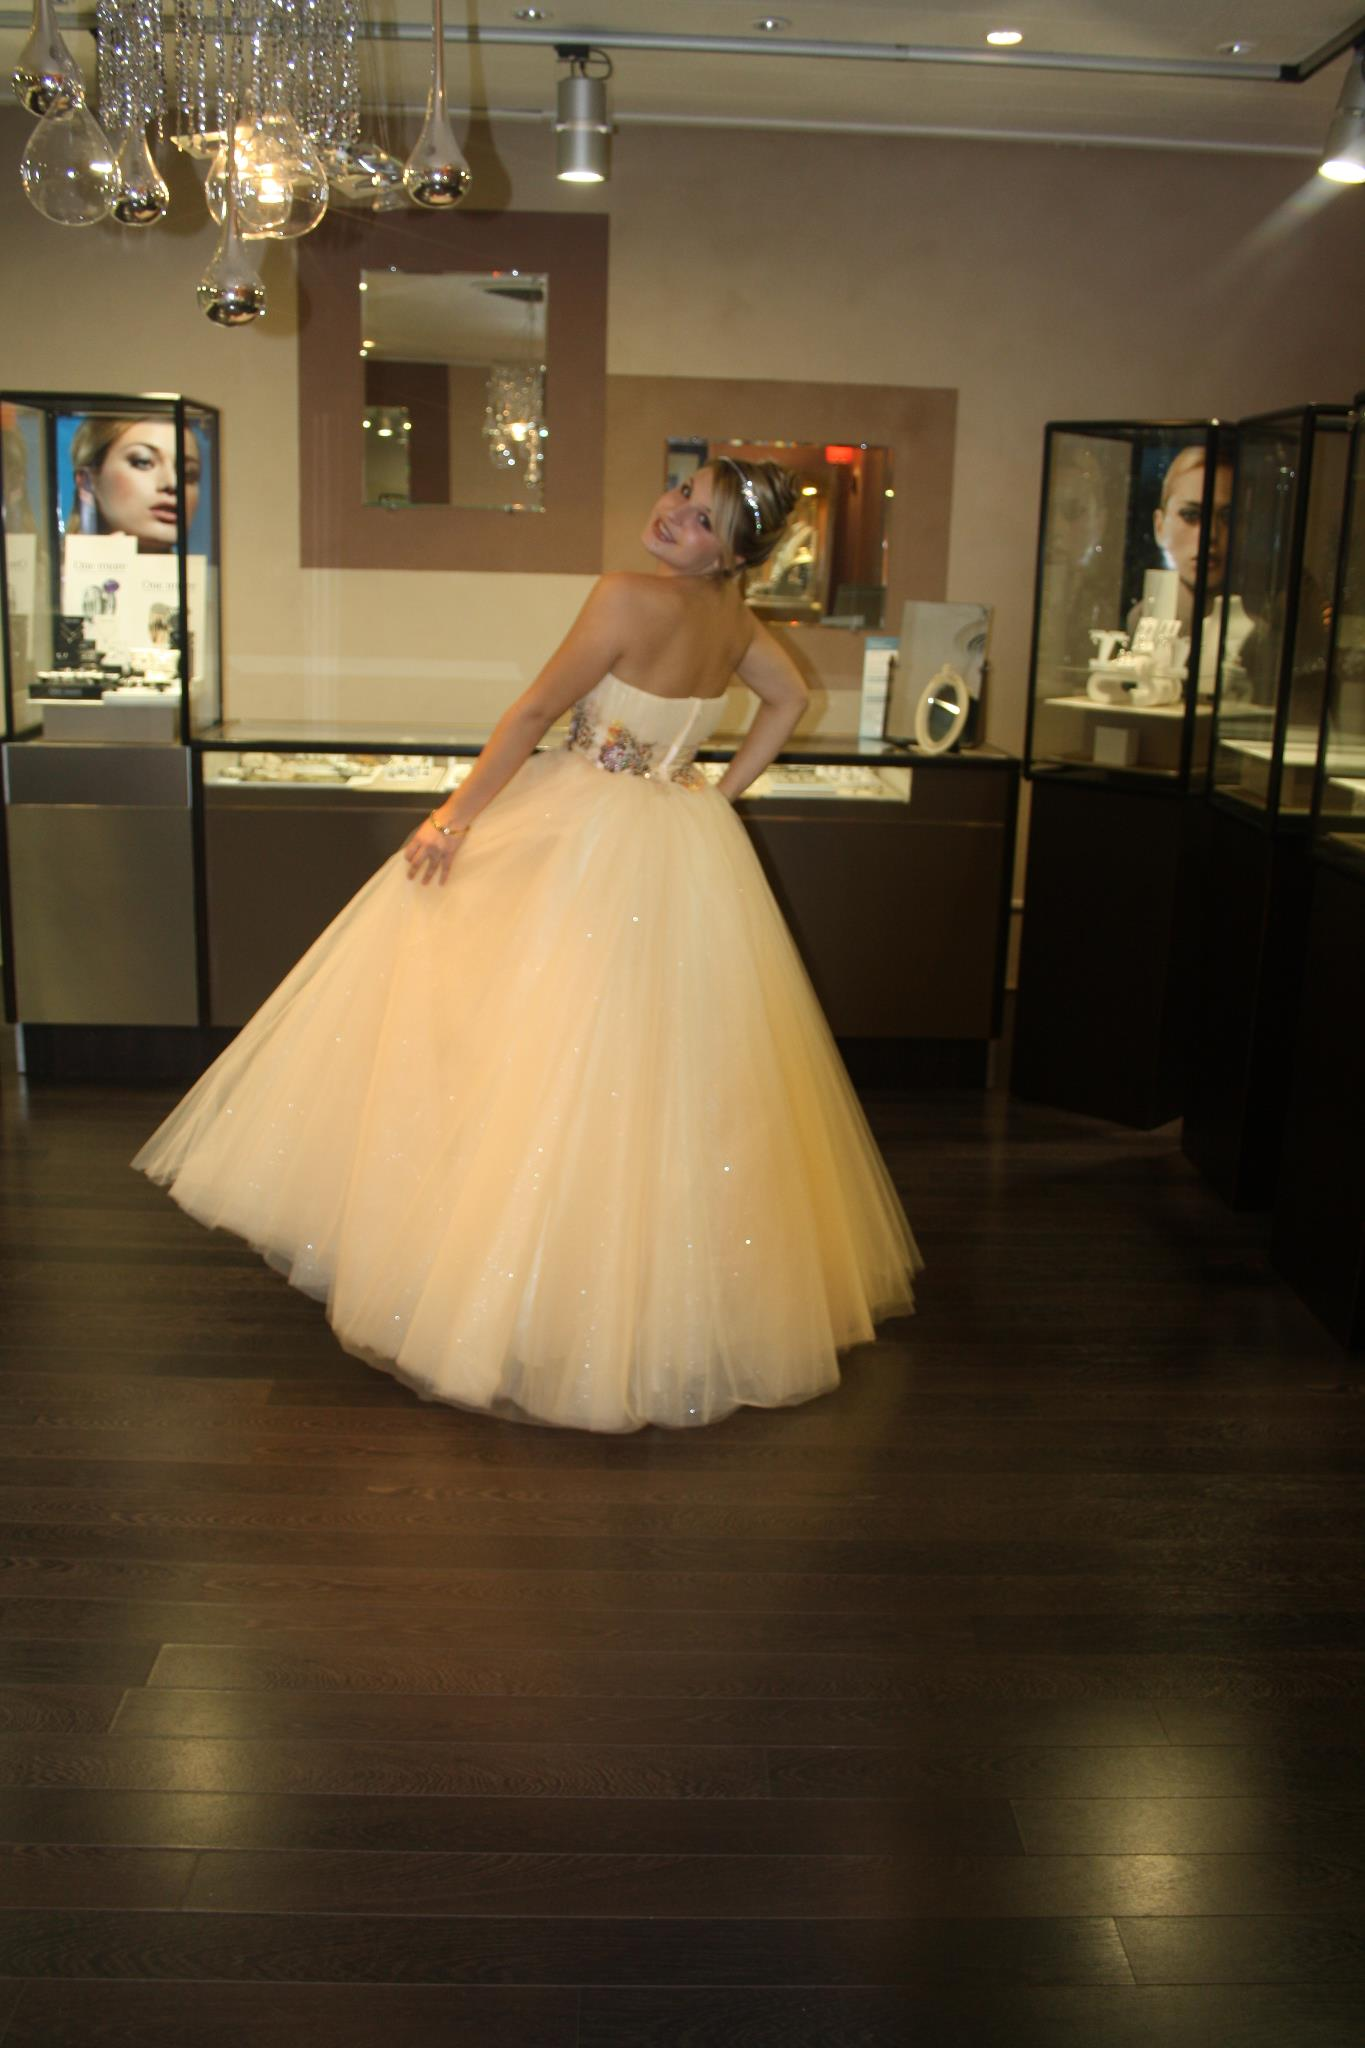 Salon du mariage Lery Bouvier